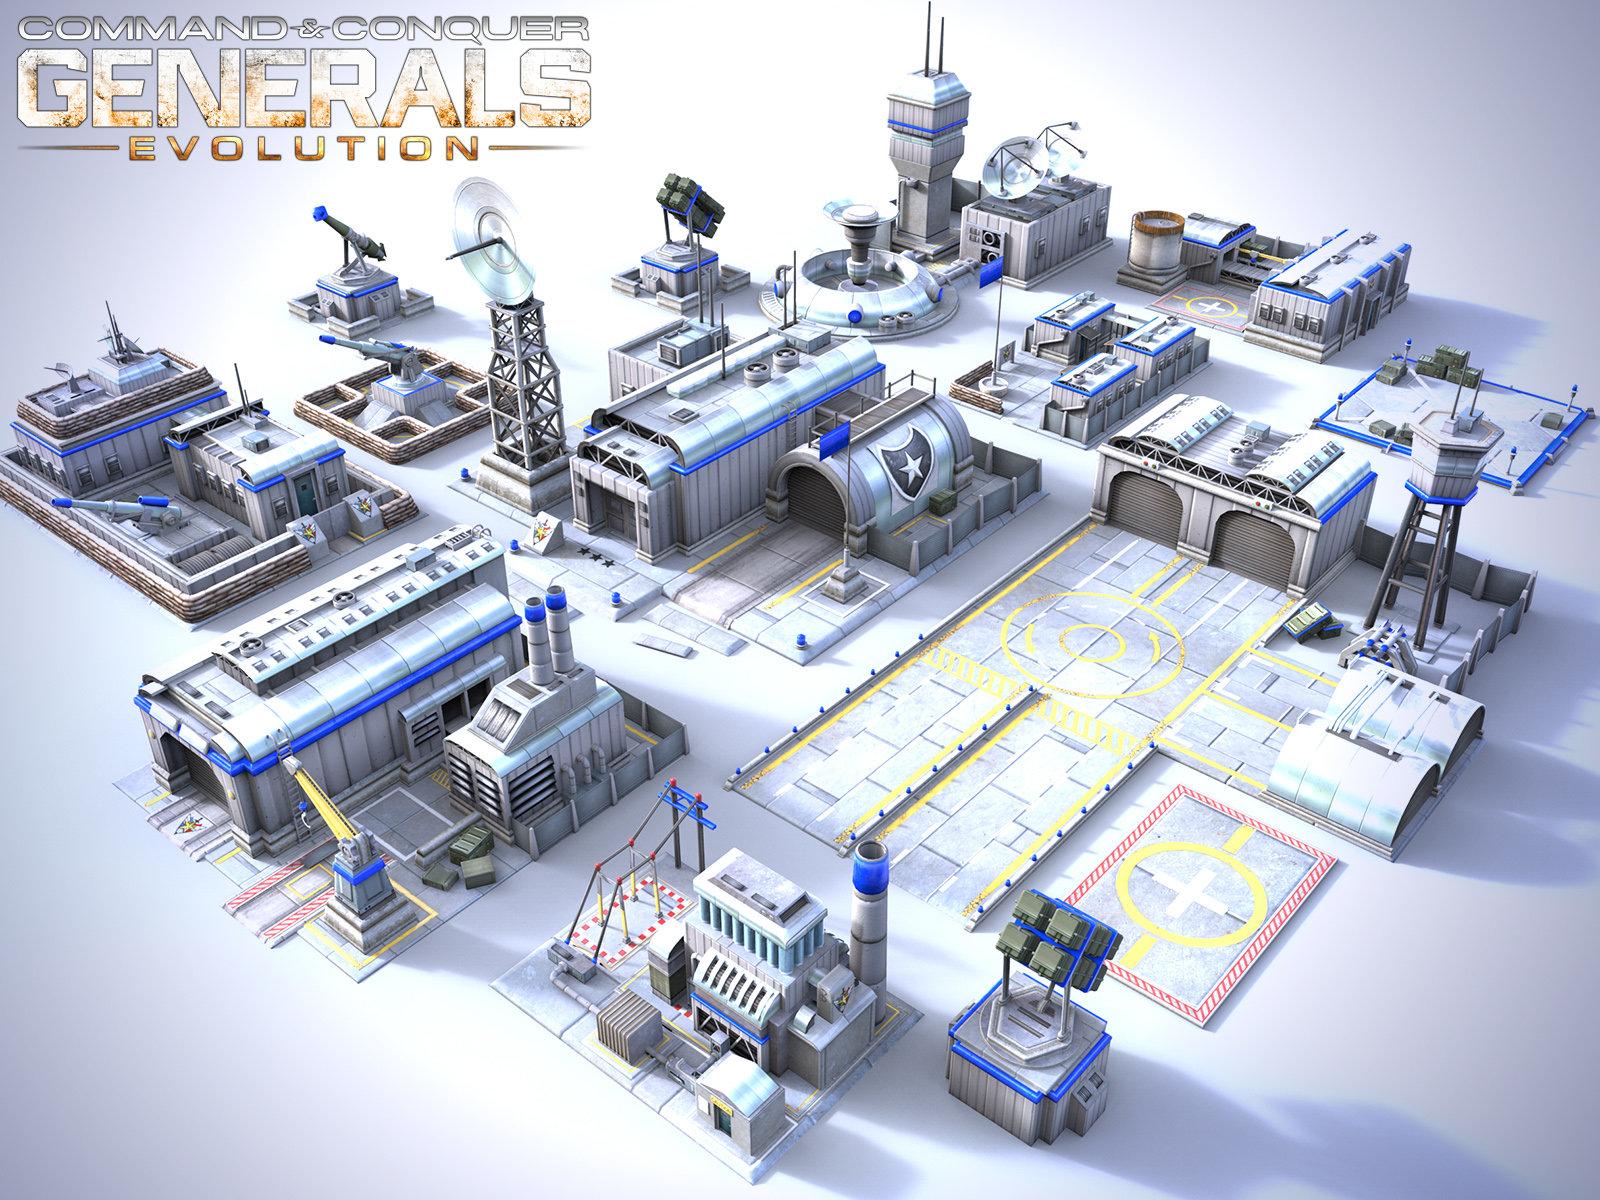 soenke-seidel-03-cnc-generals-evolution-usa-buildings-render.jpg